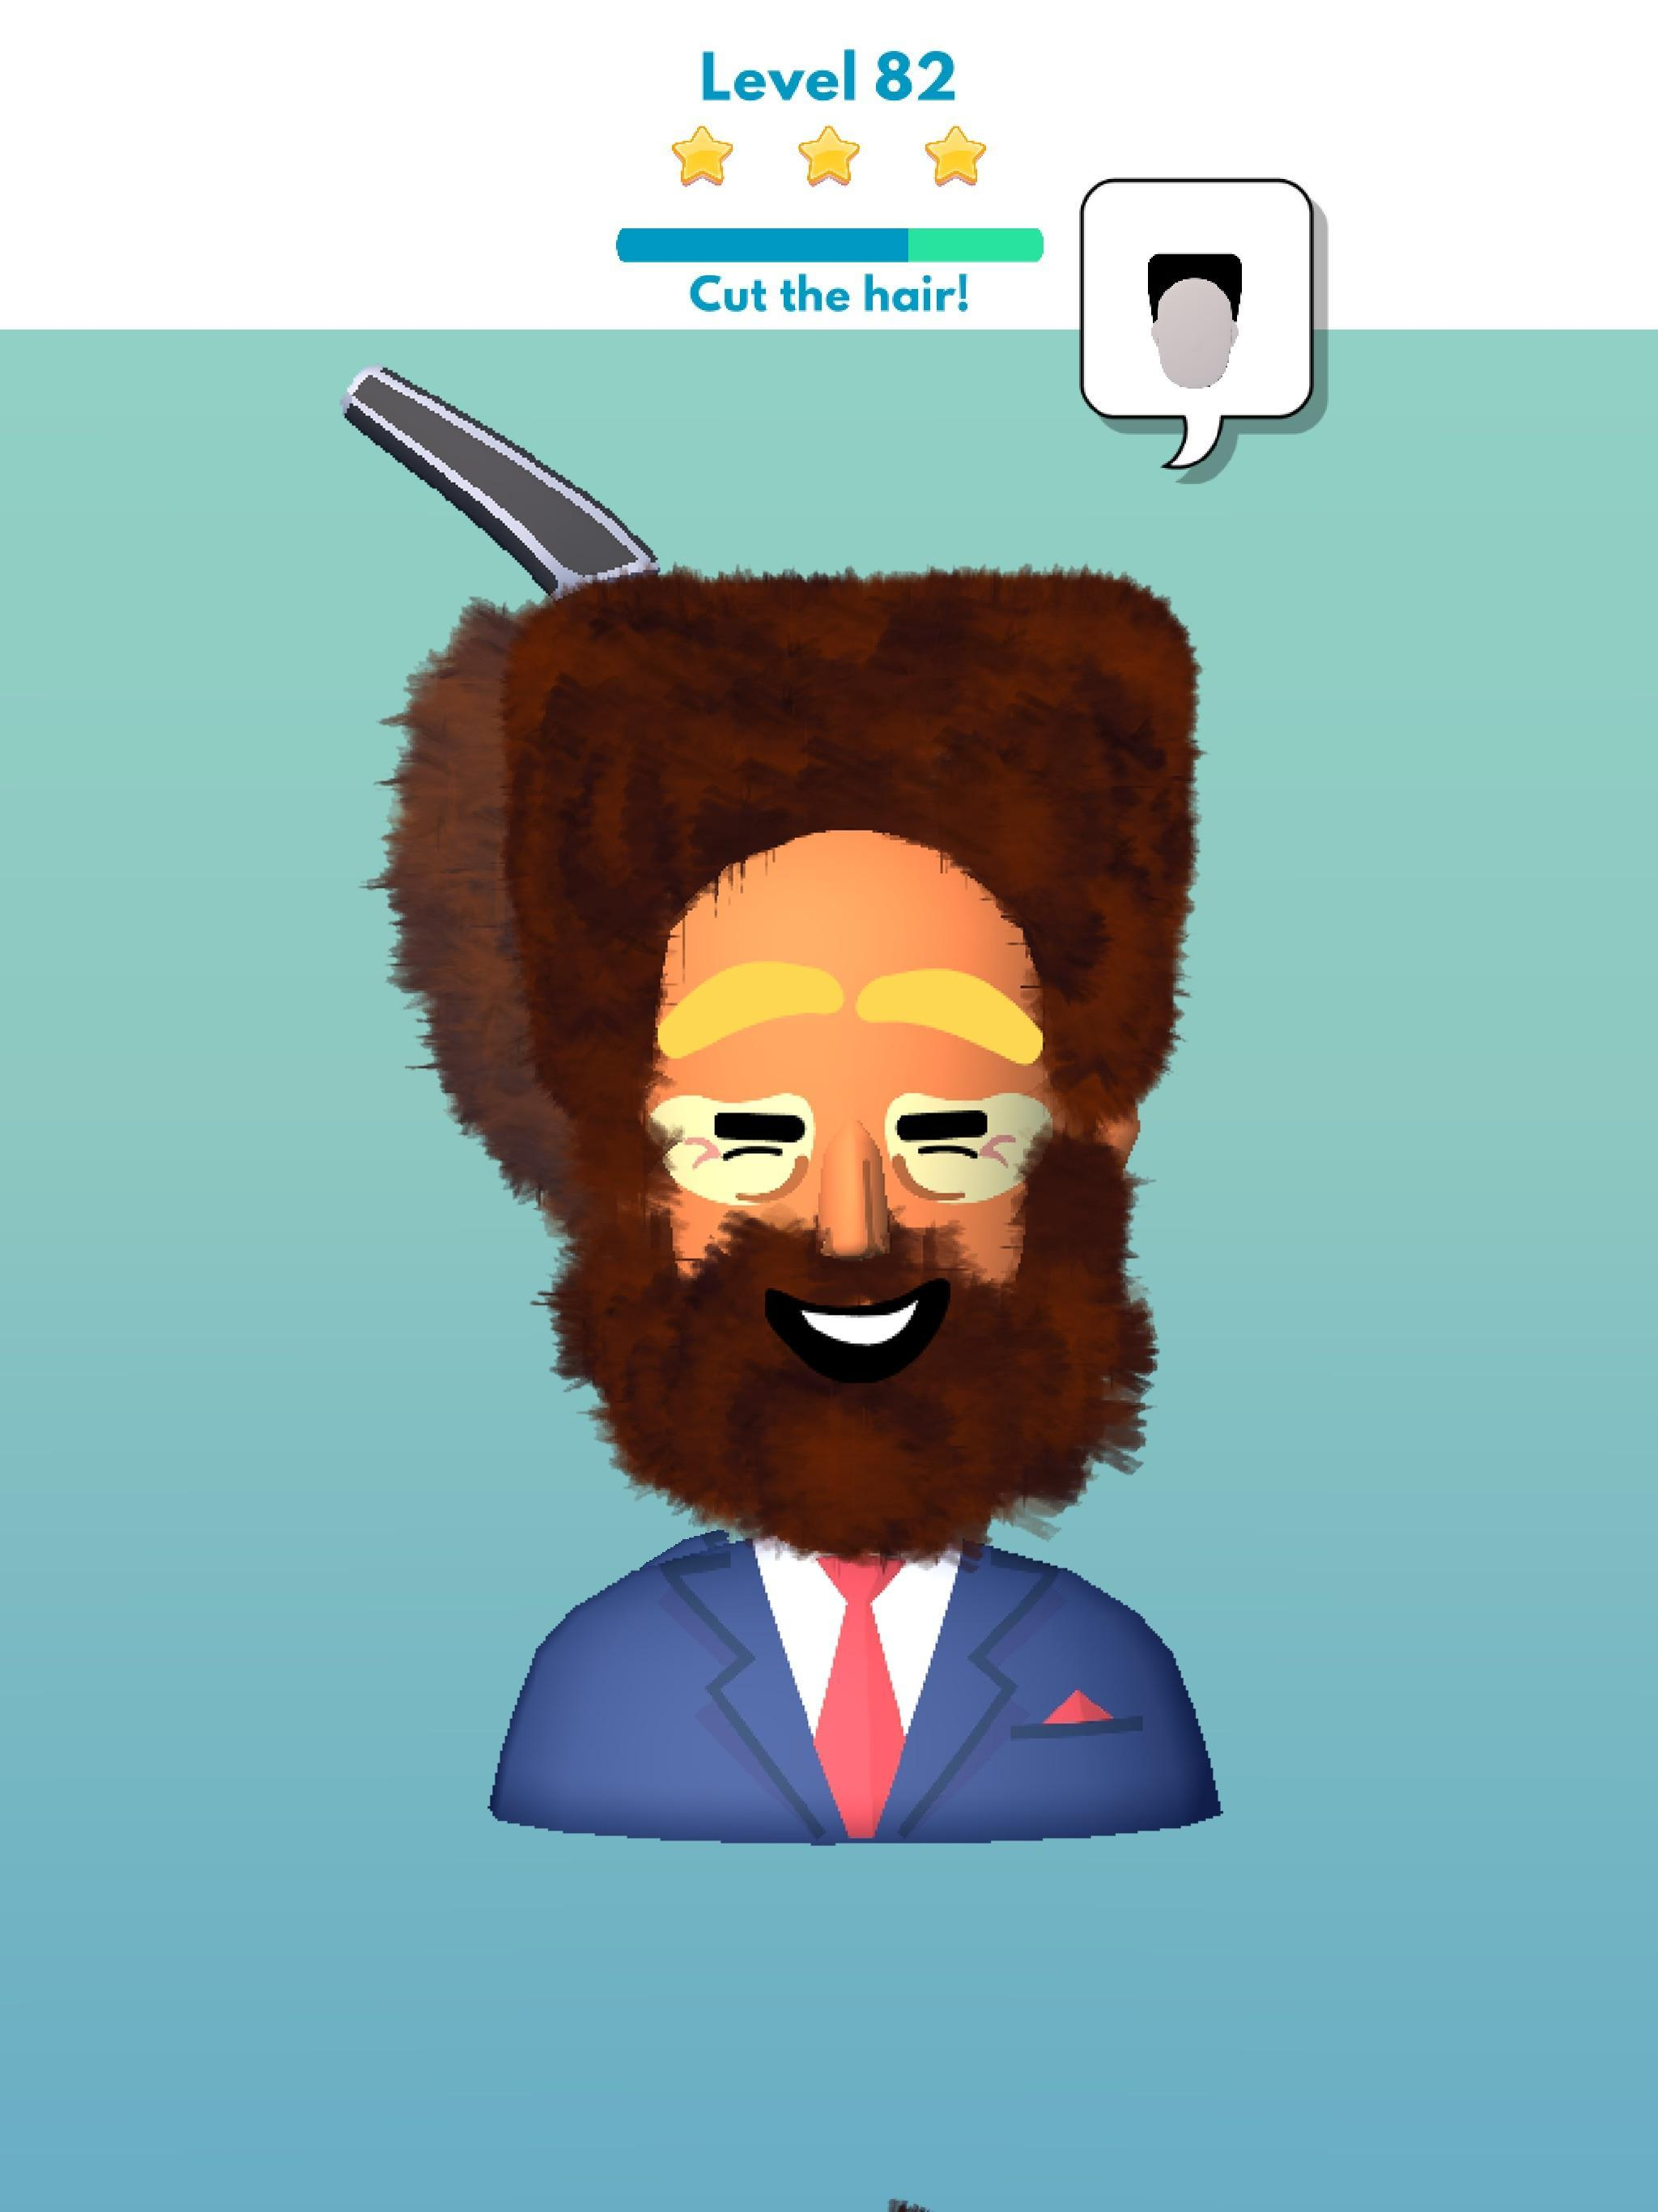 Barber Shop Hair Cut Game Para Android Apk Baixar